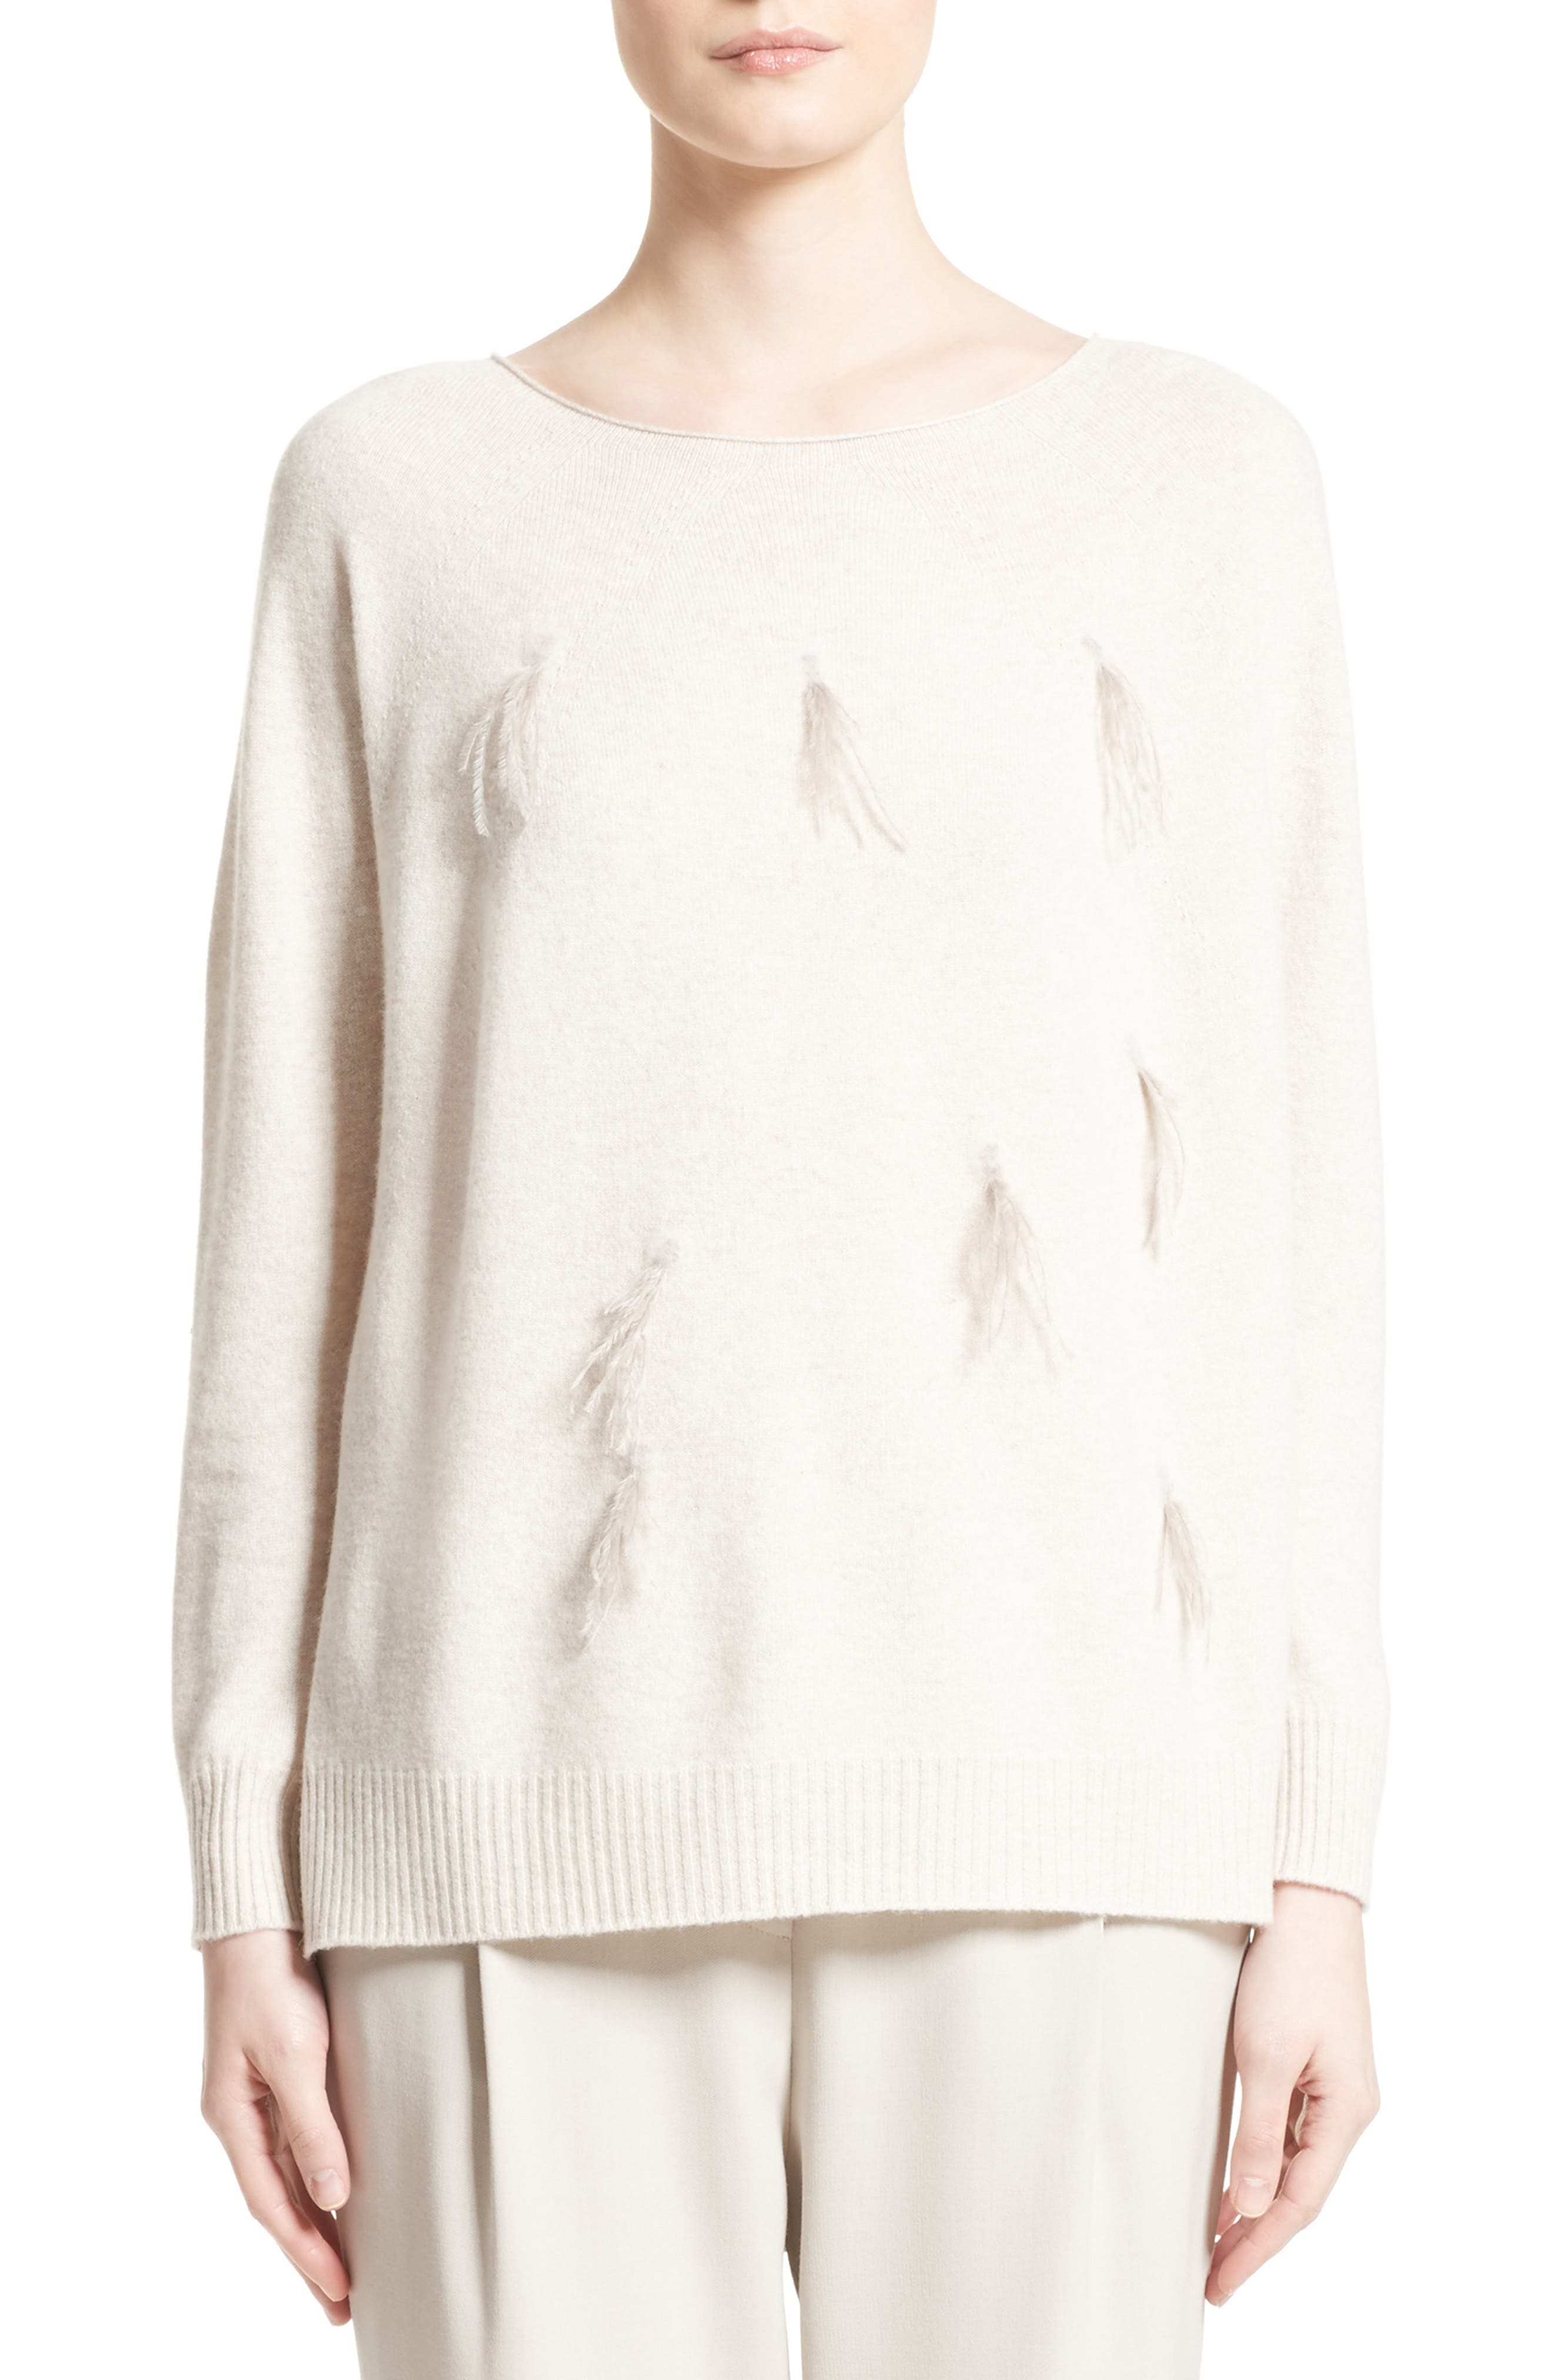 Main Image - Fabiana Filippi Needle Punch Ostrich Feather Trim Sweater